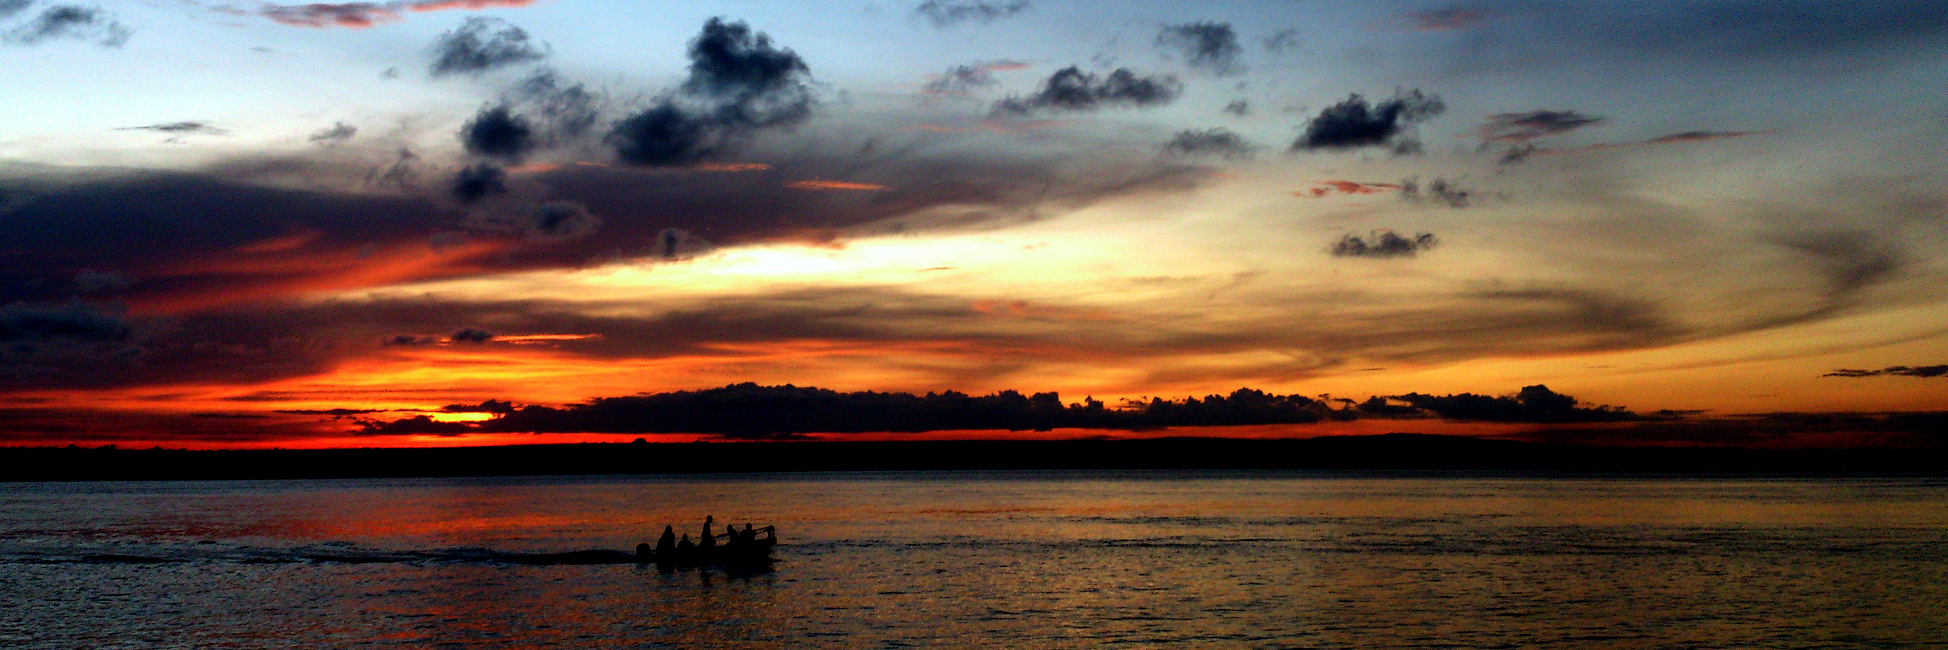 Pescatori nel tramonto, Mida Creek, Watamu. Kenya.